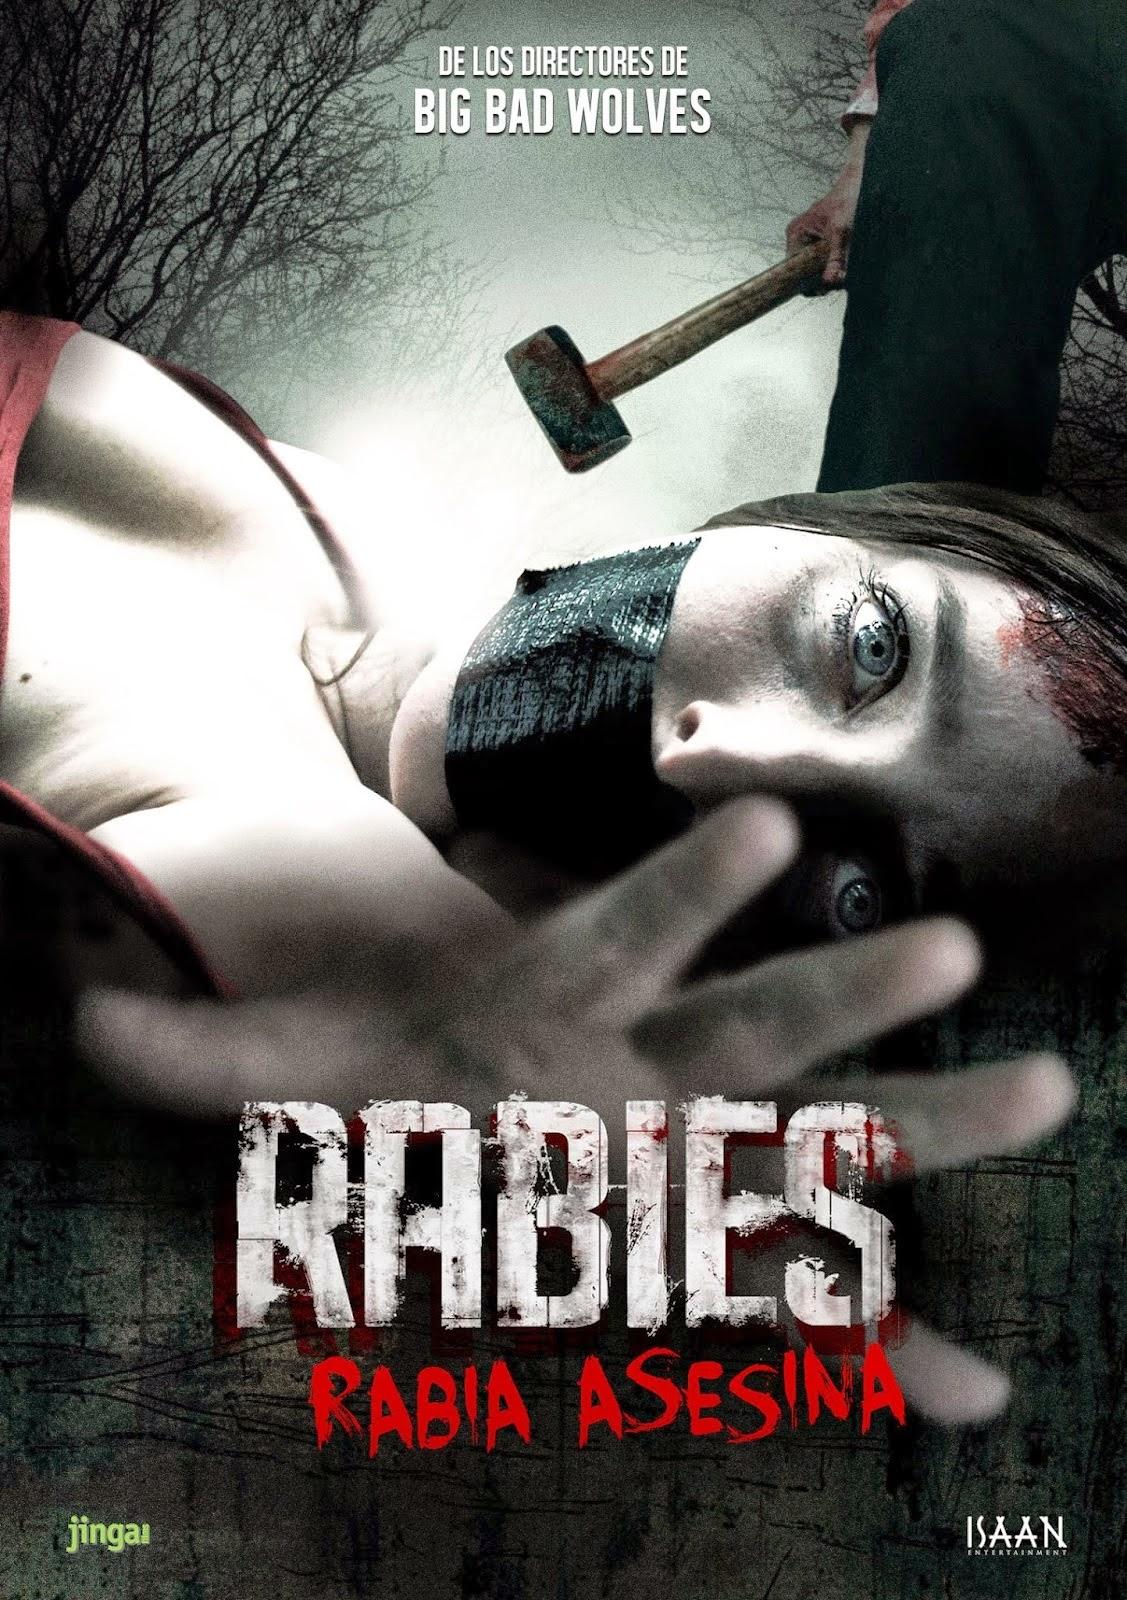 DVD ZONE: Rabies - Rabia Asesina (2010)